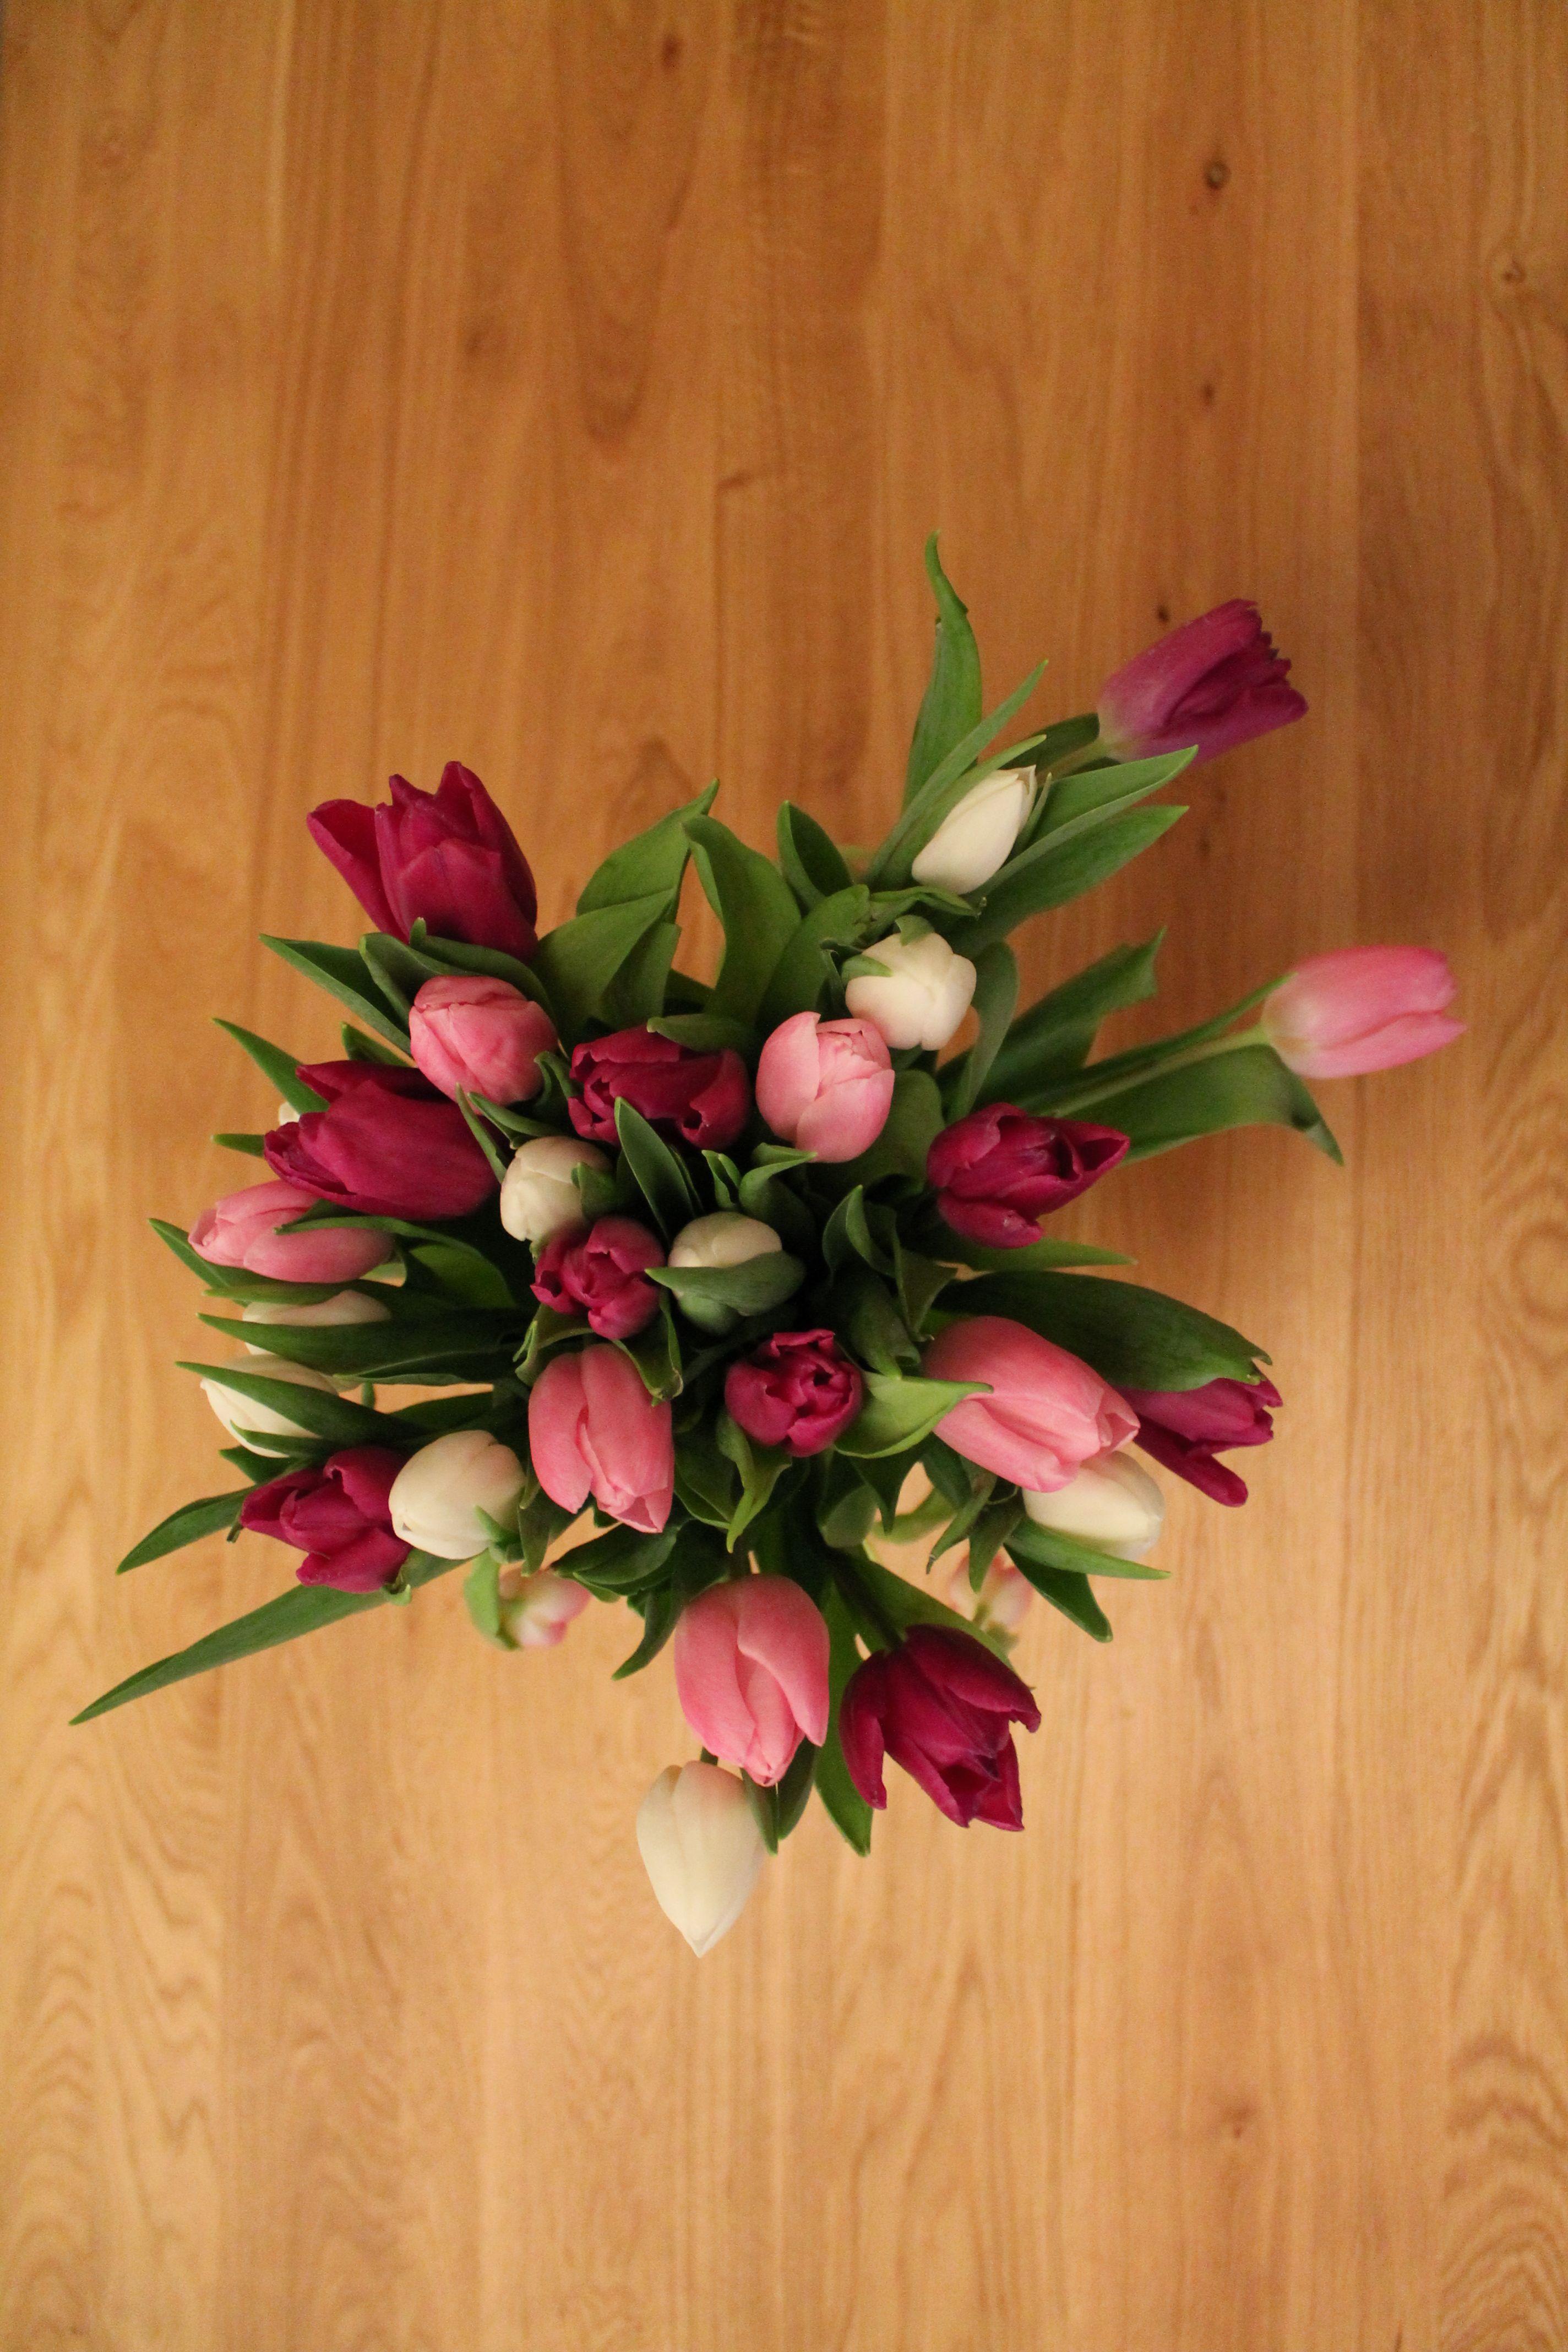 Tulipanes Holandeses 3 Tulips Tulipanes Arreglos